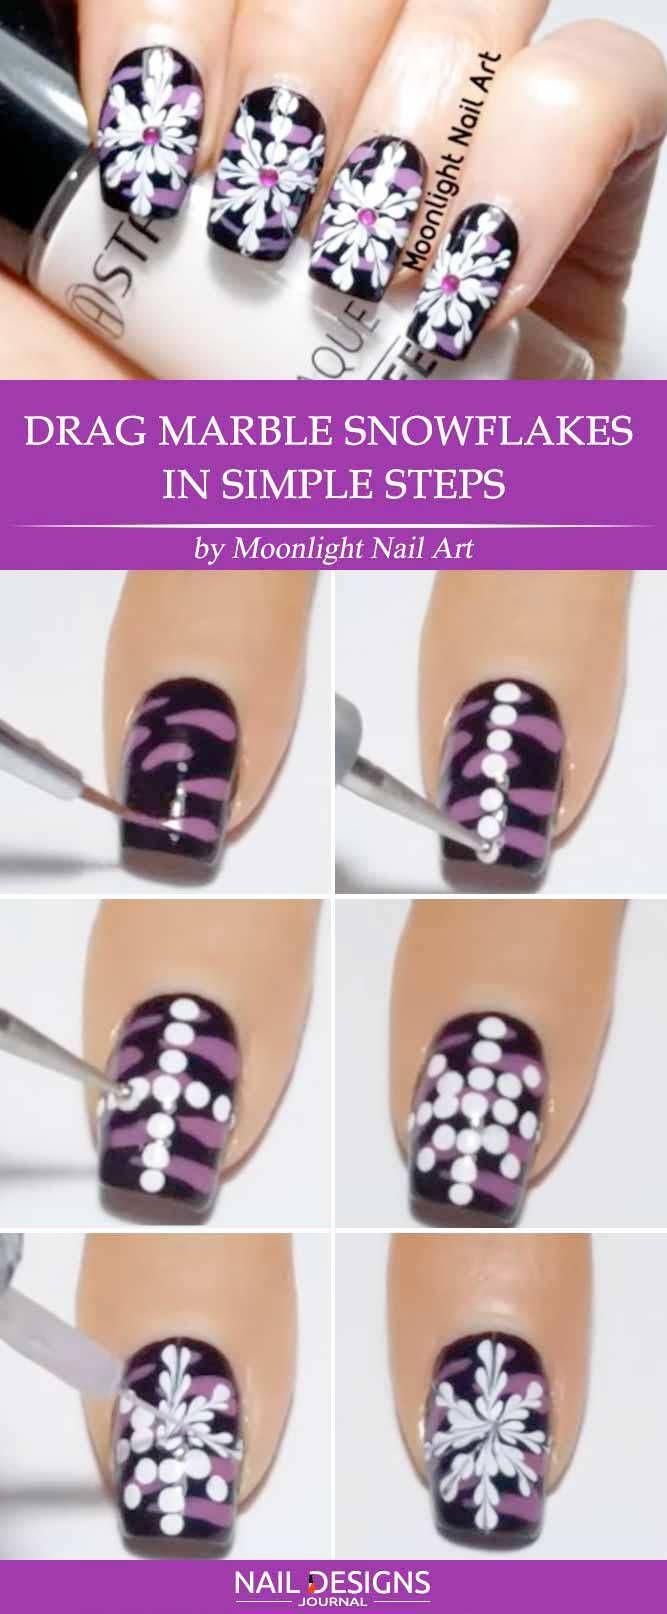 7 Tutorials On Snowflake Nails Designs Nailed It Pinterest